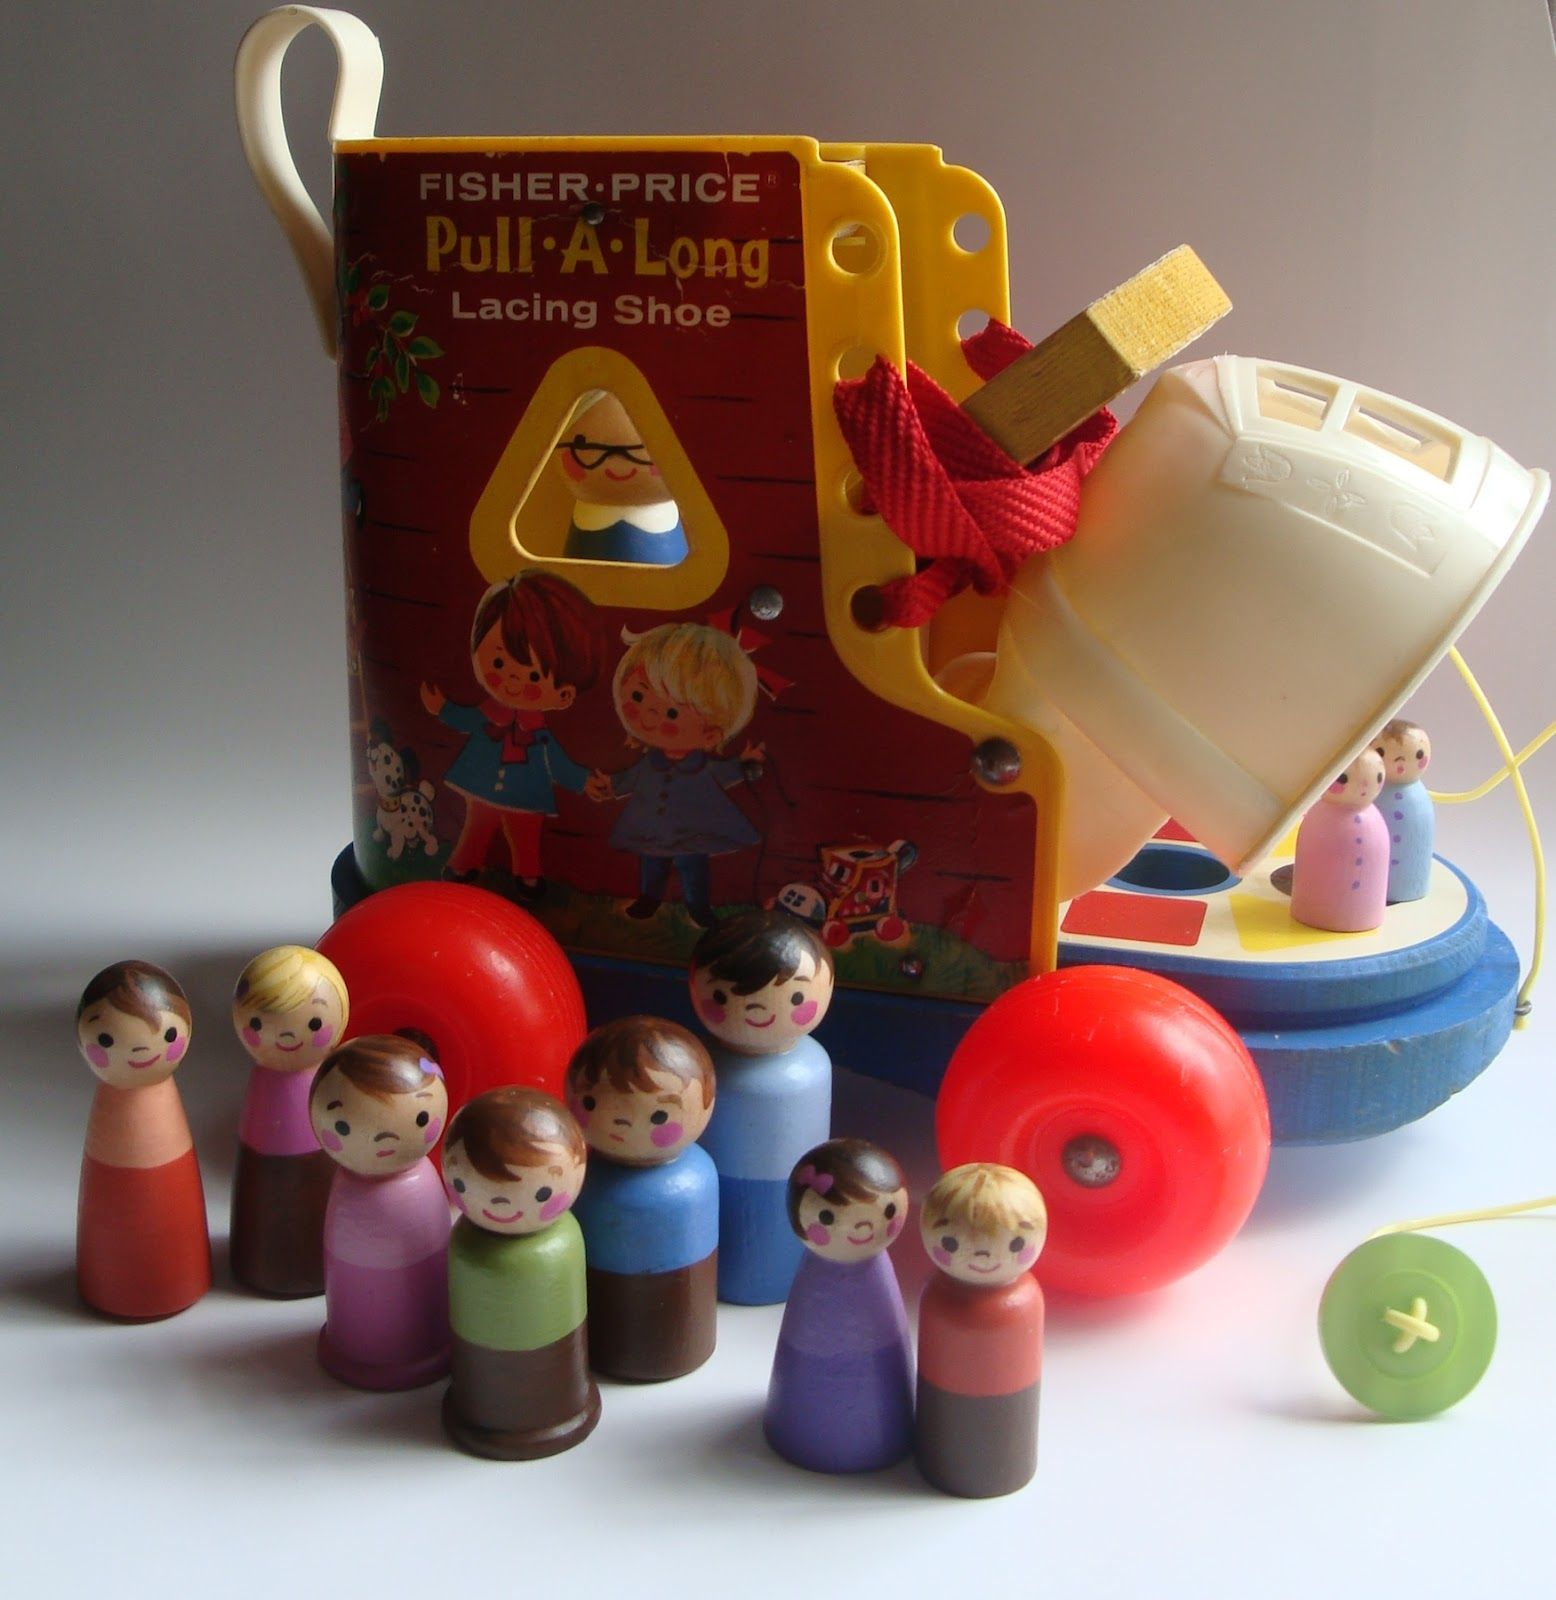 mamazakka Old toys made new  Vintage Fisher Price PullaLong